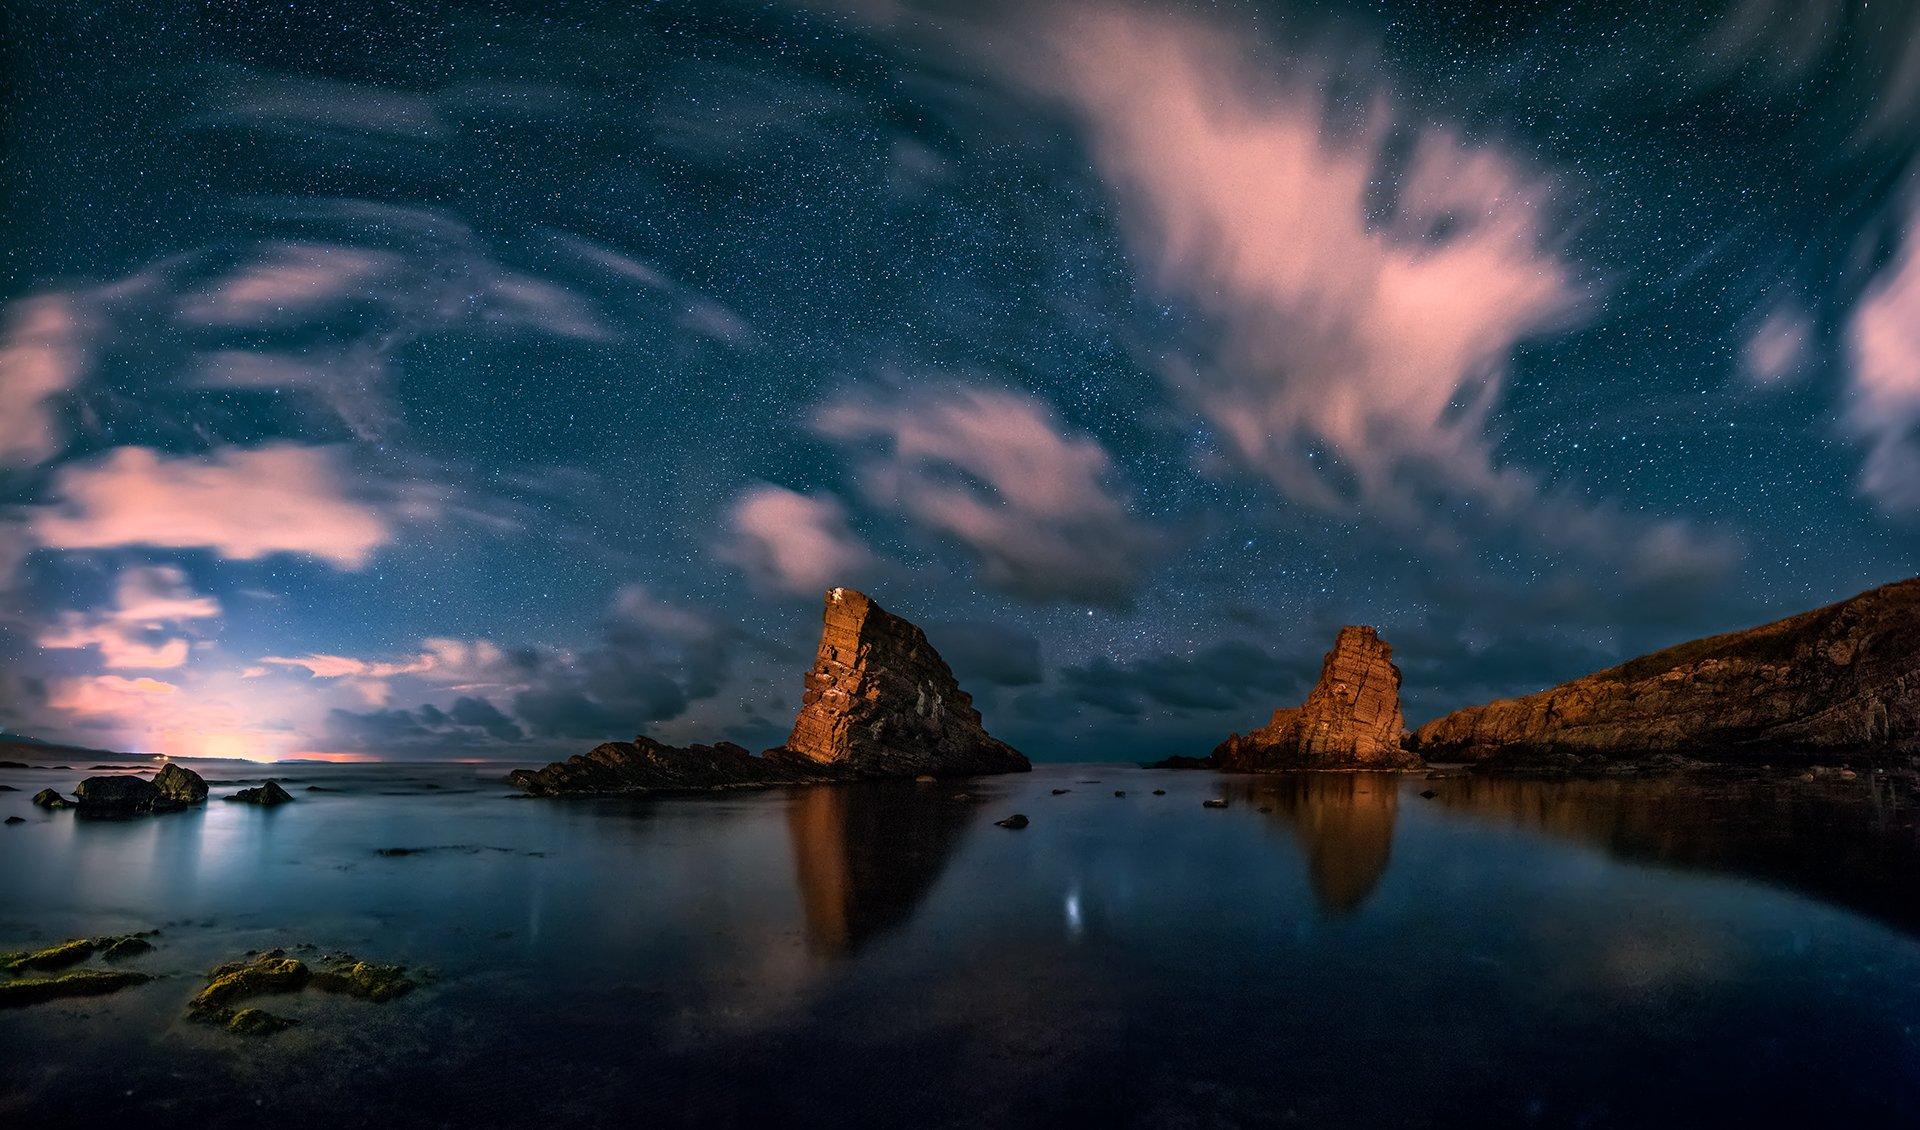 sea, rocks, landscape, night, stars, bulgaria, two ships, Руслан Асанов